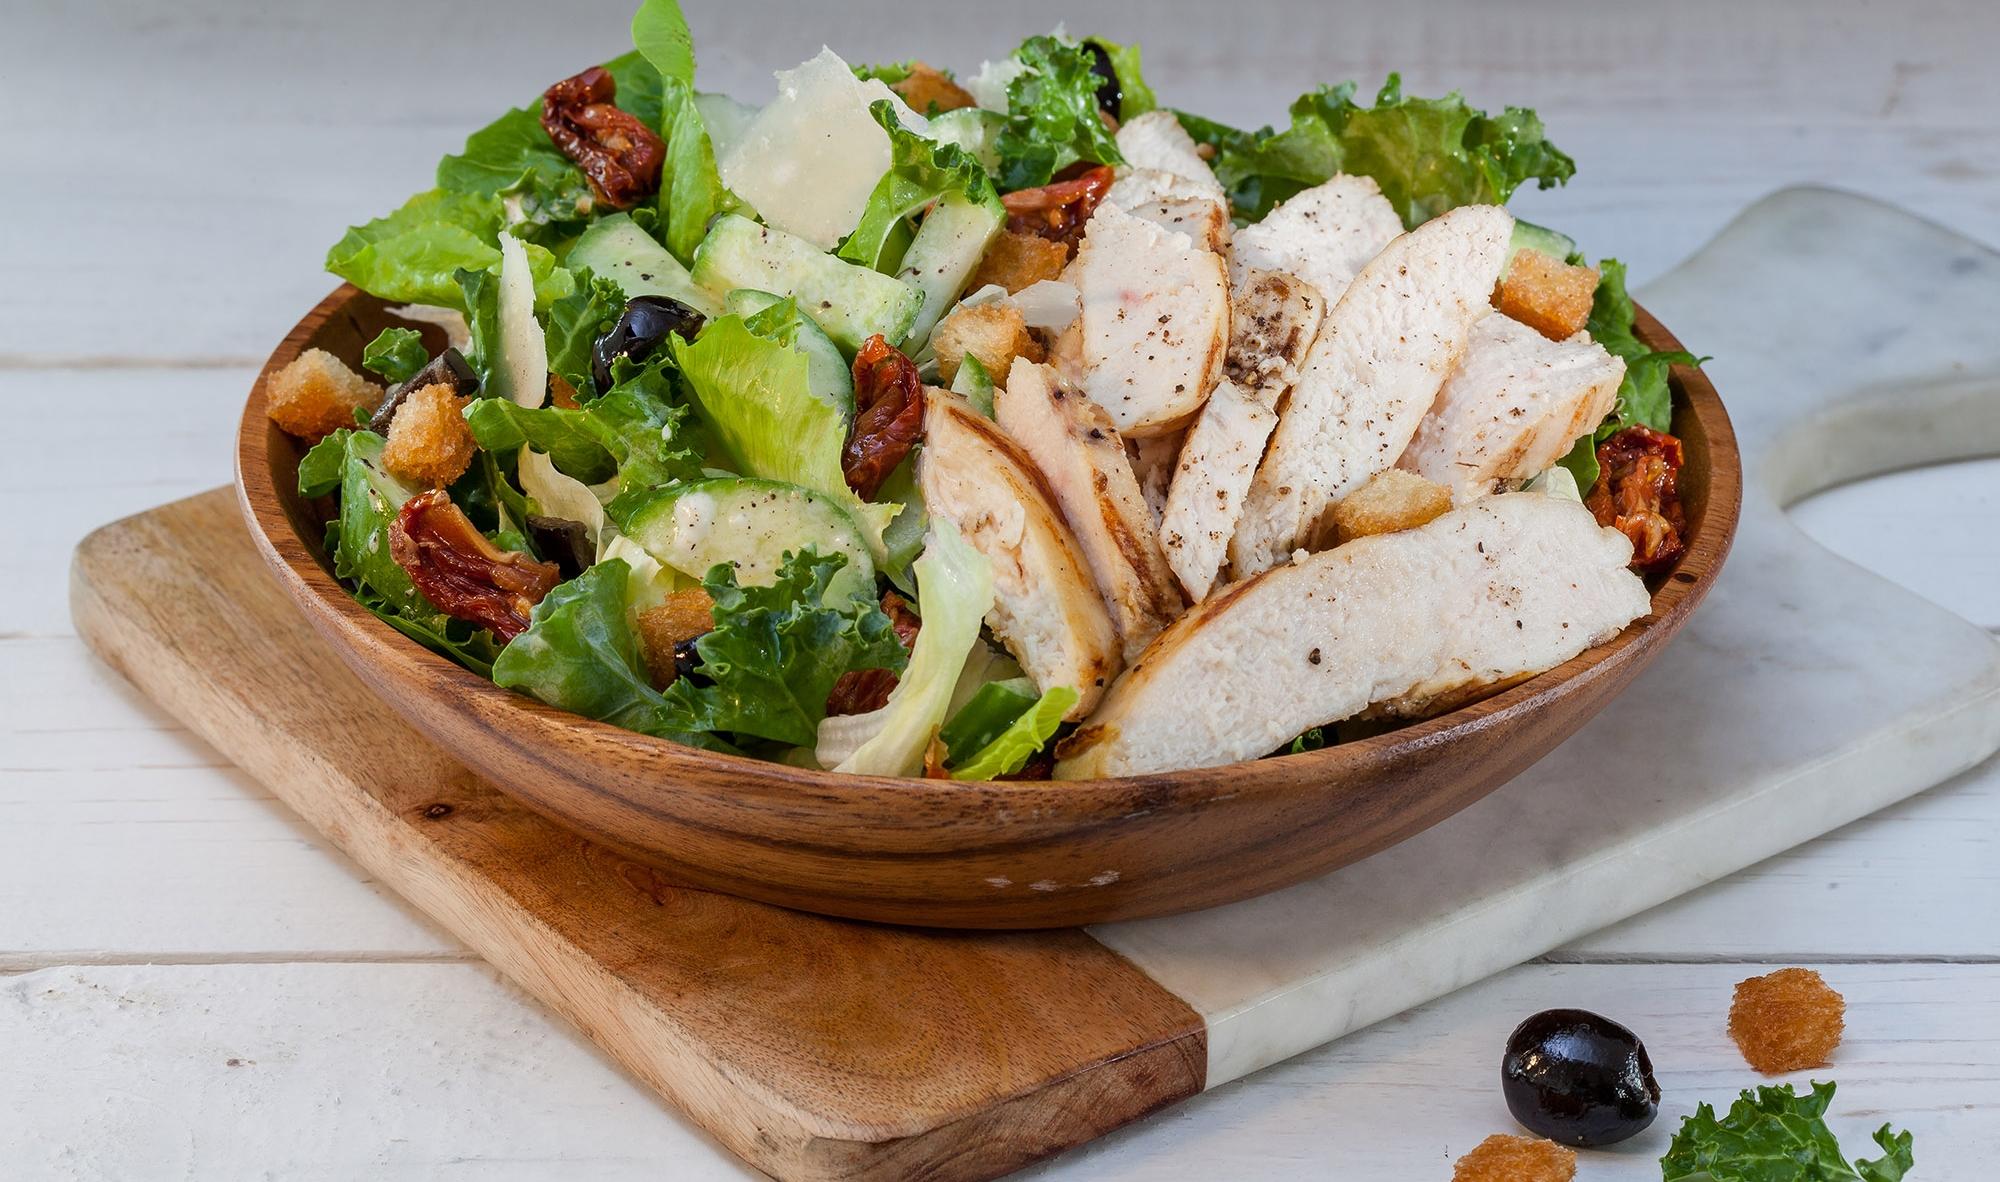 _17FM00326_FM Signature Roasted Chicken Caesar Salad - 230 kcal (Non Veg).jpg